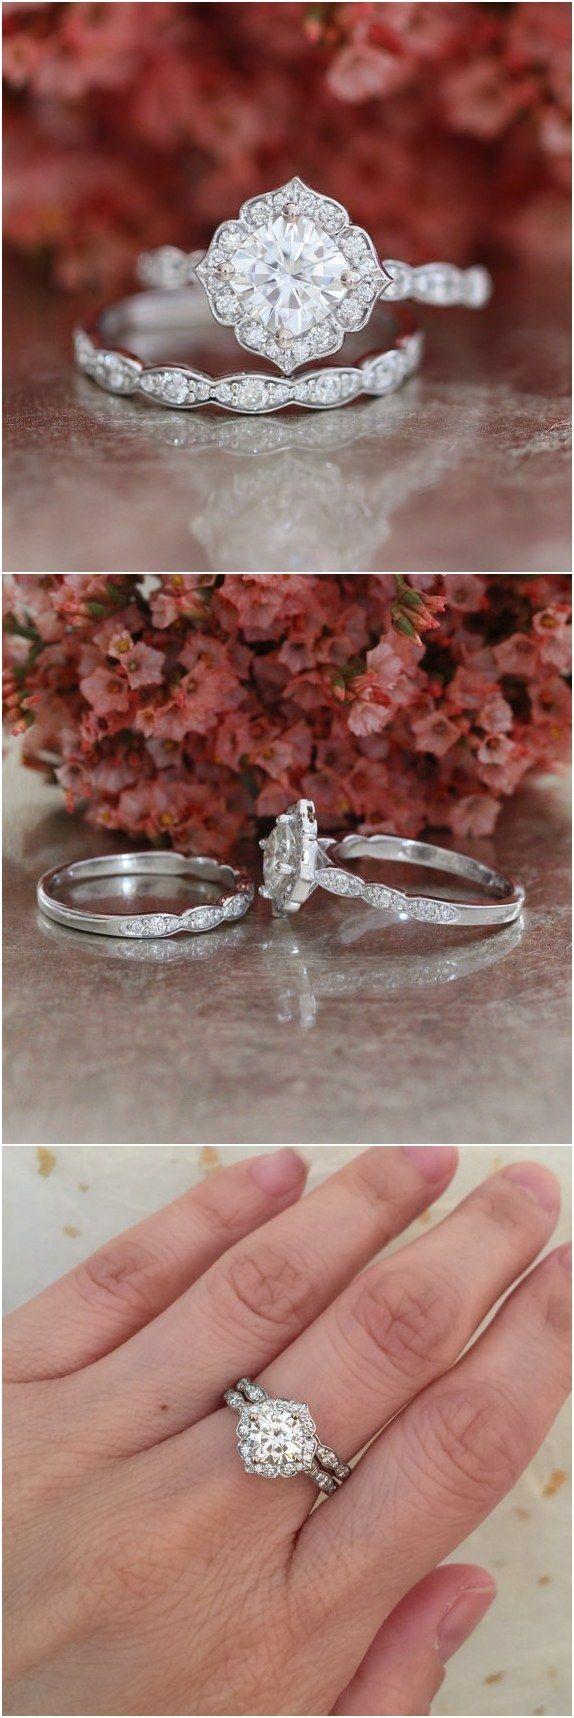 Forever One Moissanite Engagement Ring And Scalloped Diamond Wedding Band Bridal Set 14k White Gold 6x6mm